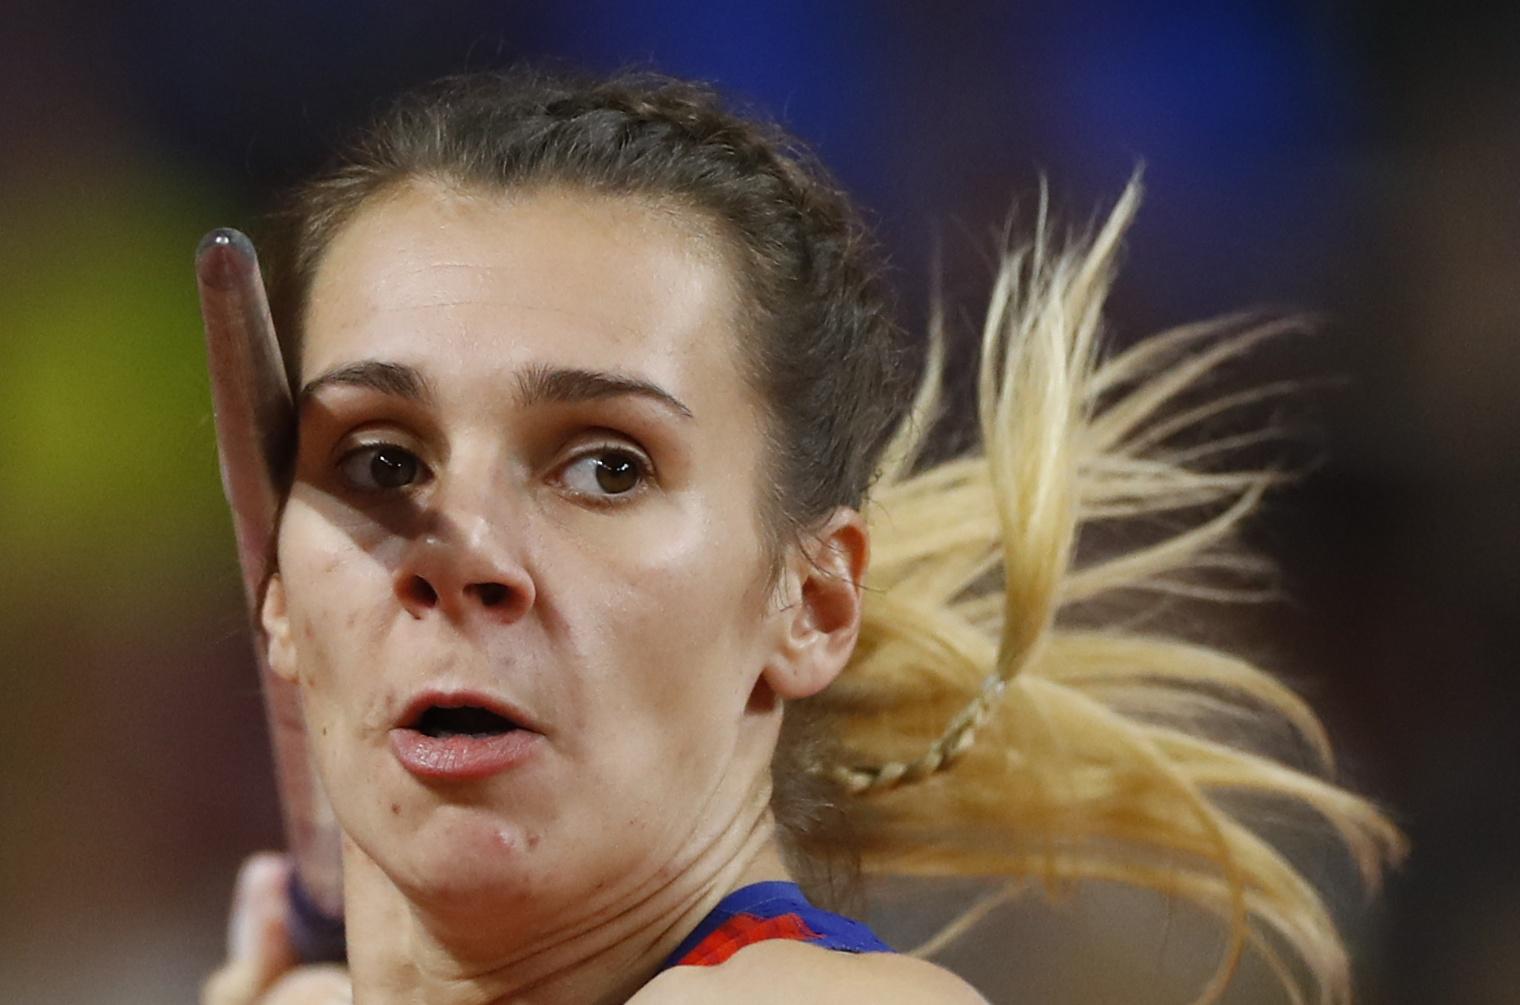 Athletics - World Athletics Championships - Doha 2019 - Women's Javelin Throw Final - Khalifa International Stadium, Doha, Qatar - October 1, 2019  Croatia's Sara Kolak in action REUTERS/Kai Pfaffenbach - UP1EFA11IX5UM